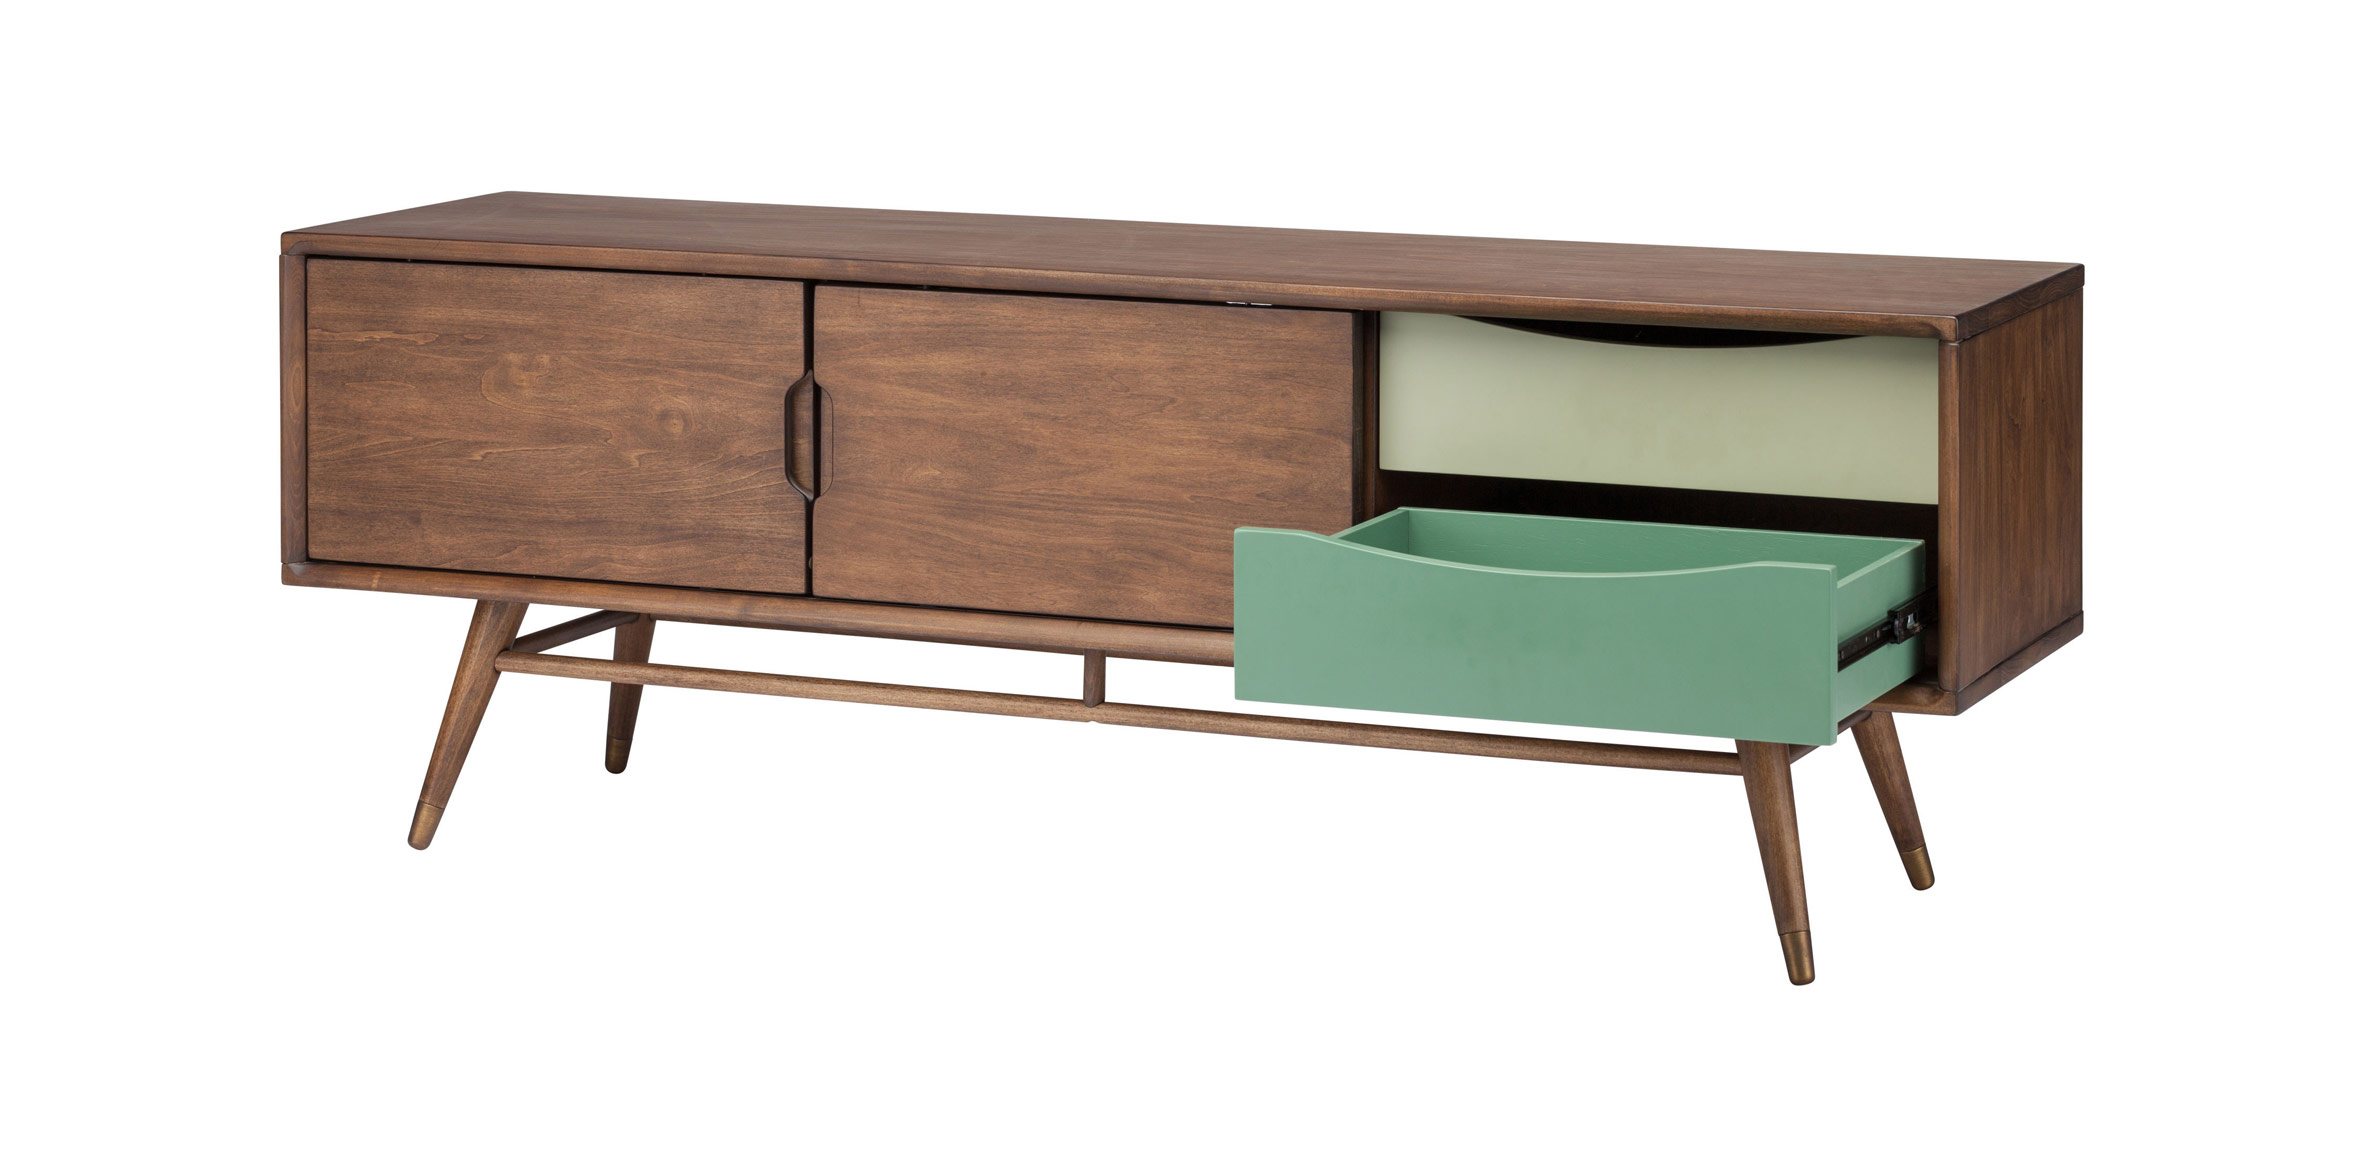 Maarten media unit hip furniture for Hip furniture